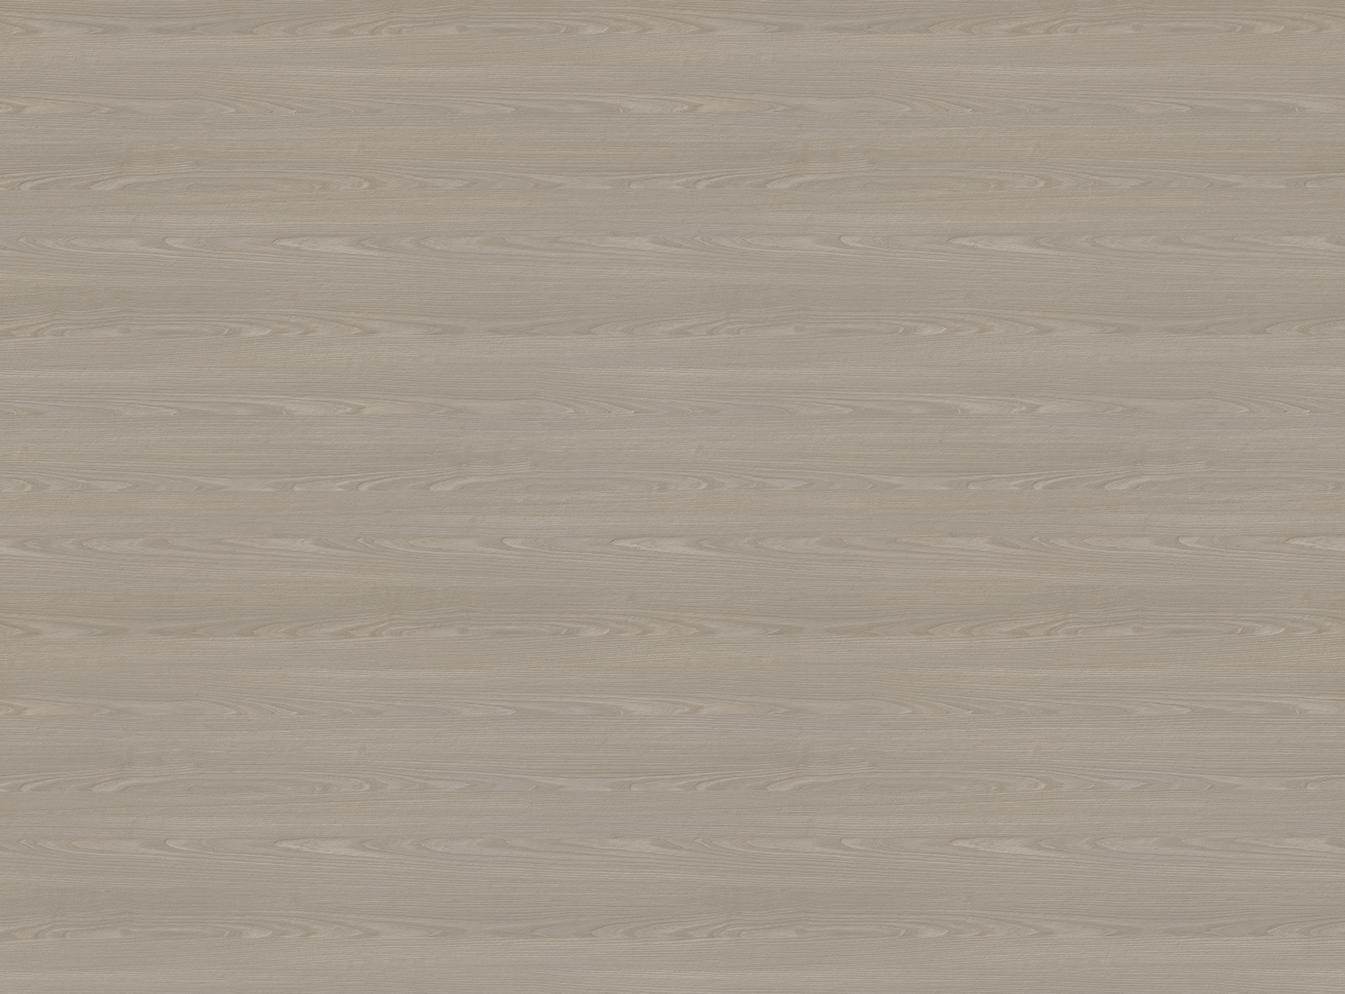 Лента AБC S144 26/1 Tivoli